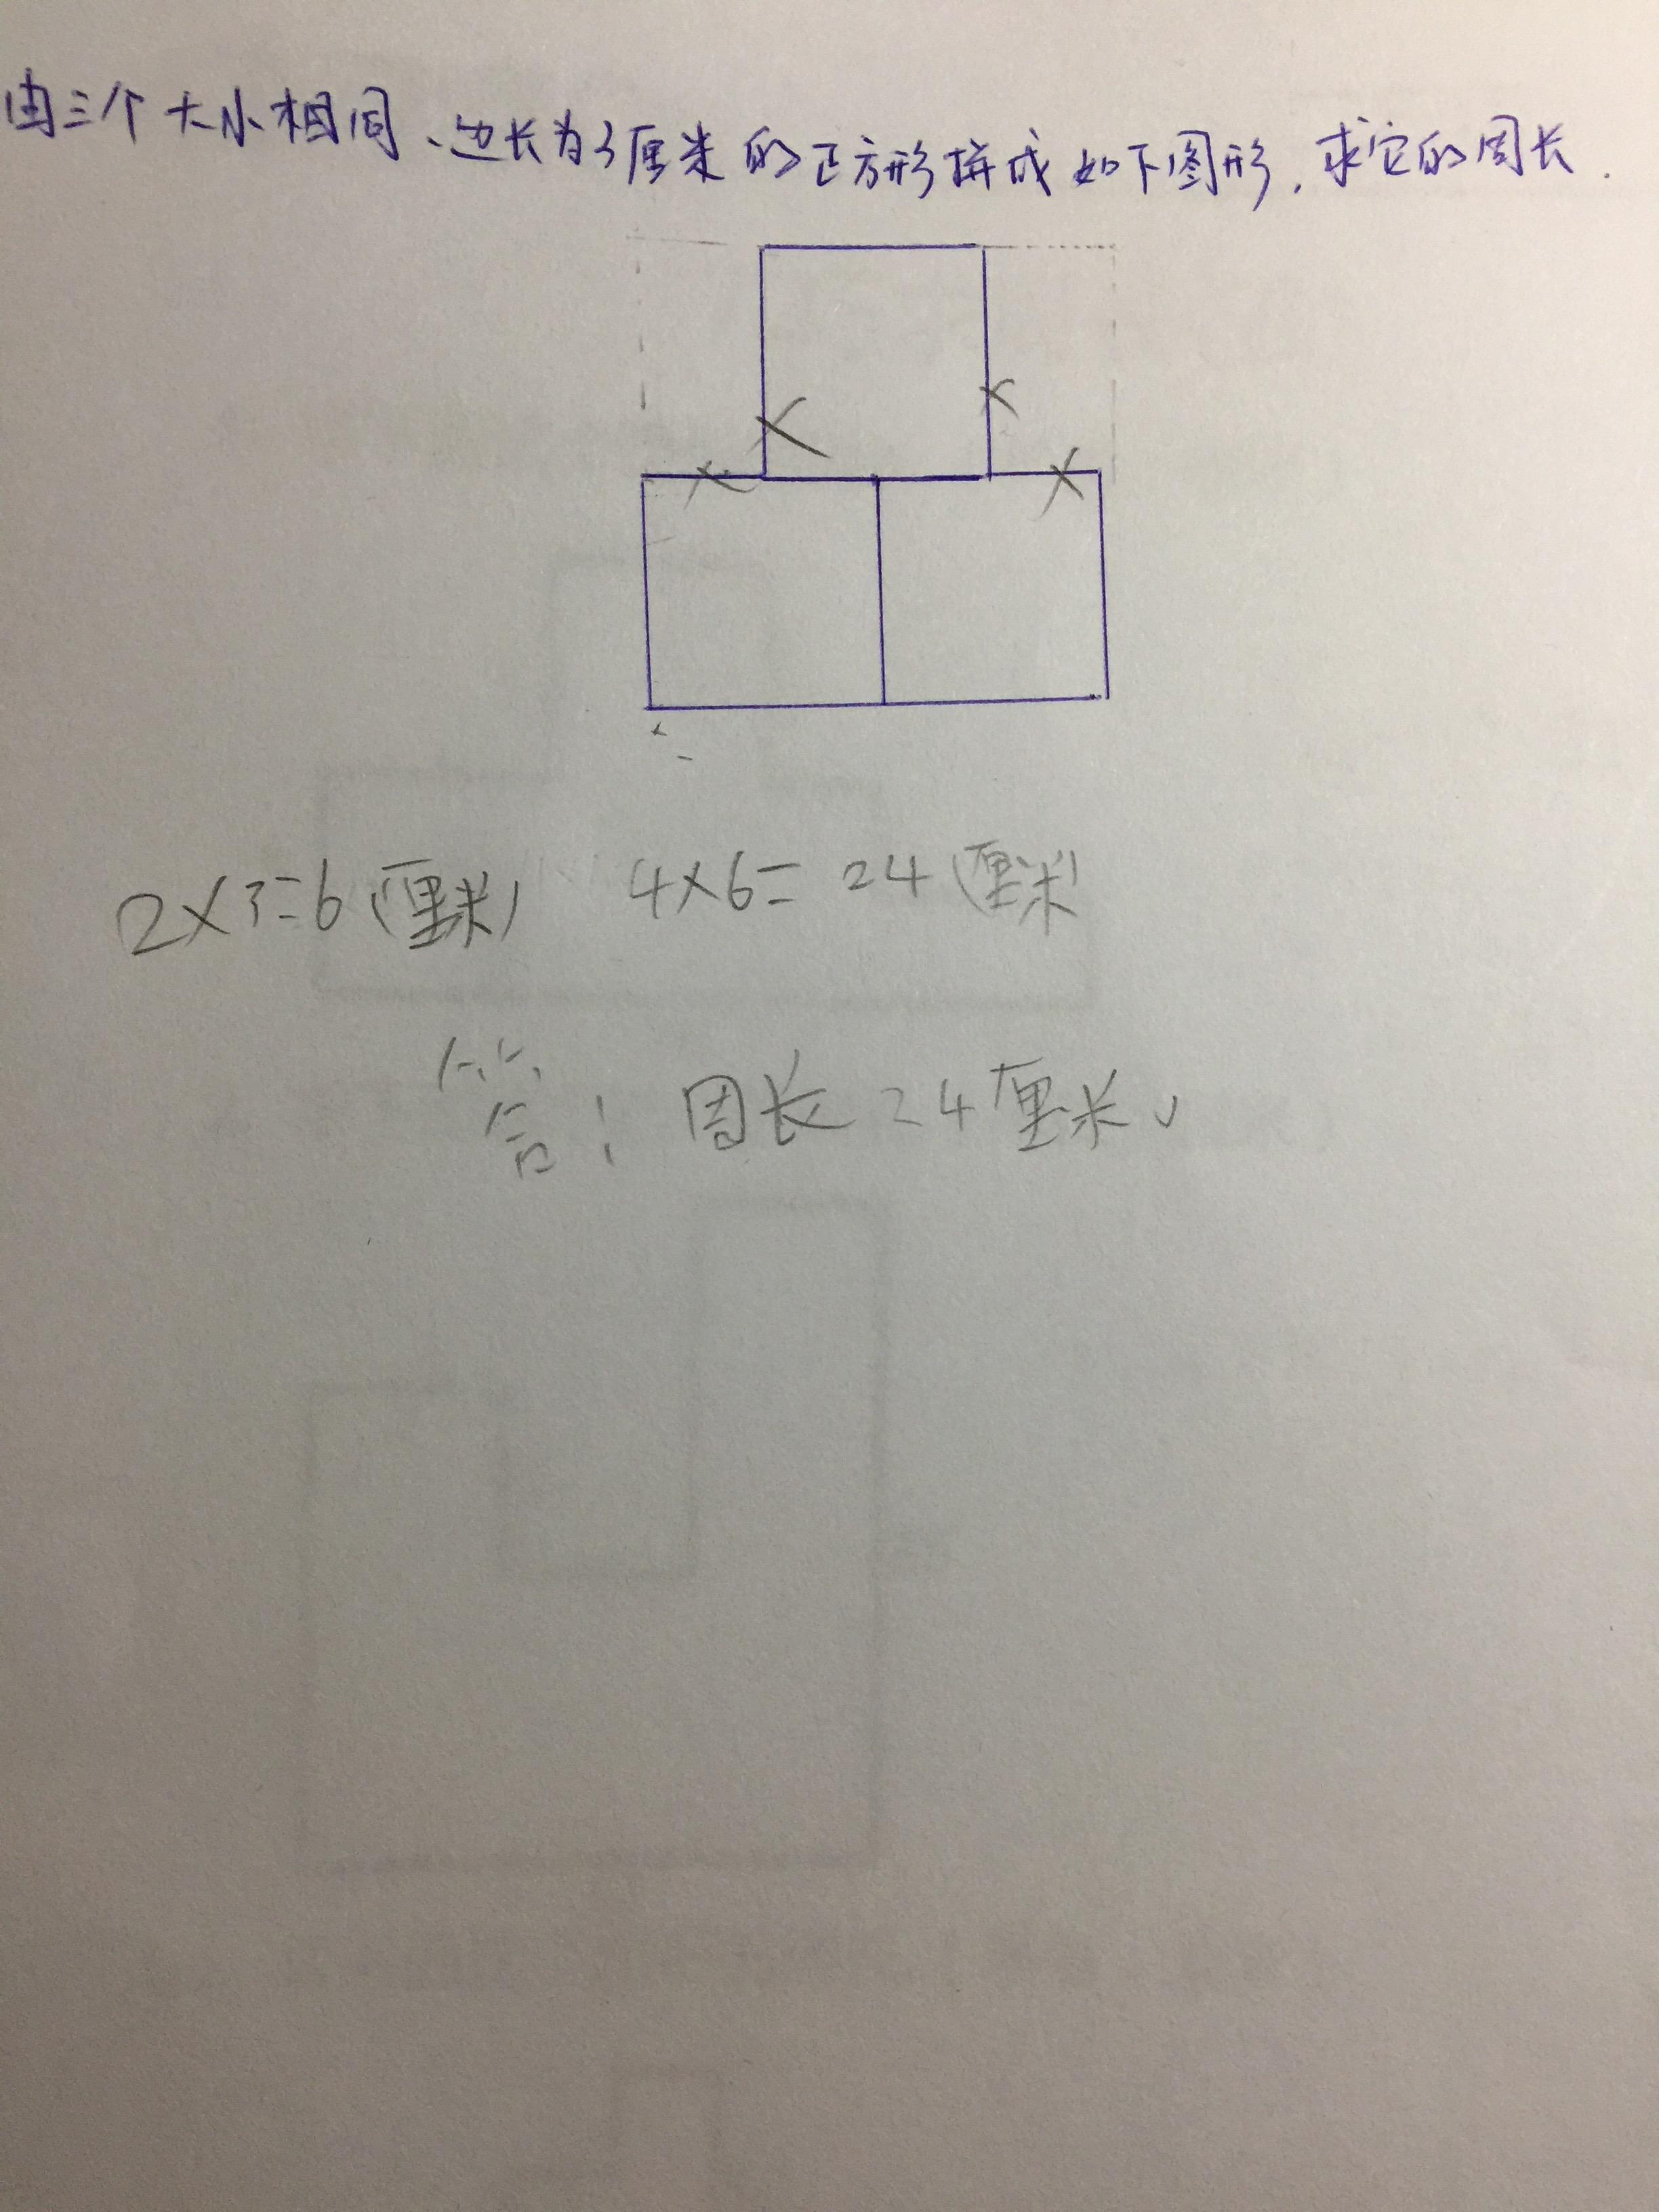 3CCCEE13-3F9A-425B-AB0C-D76A43B4F022.jpg